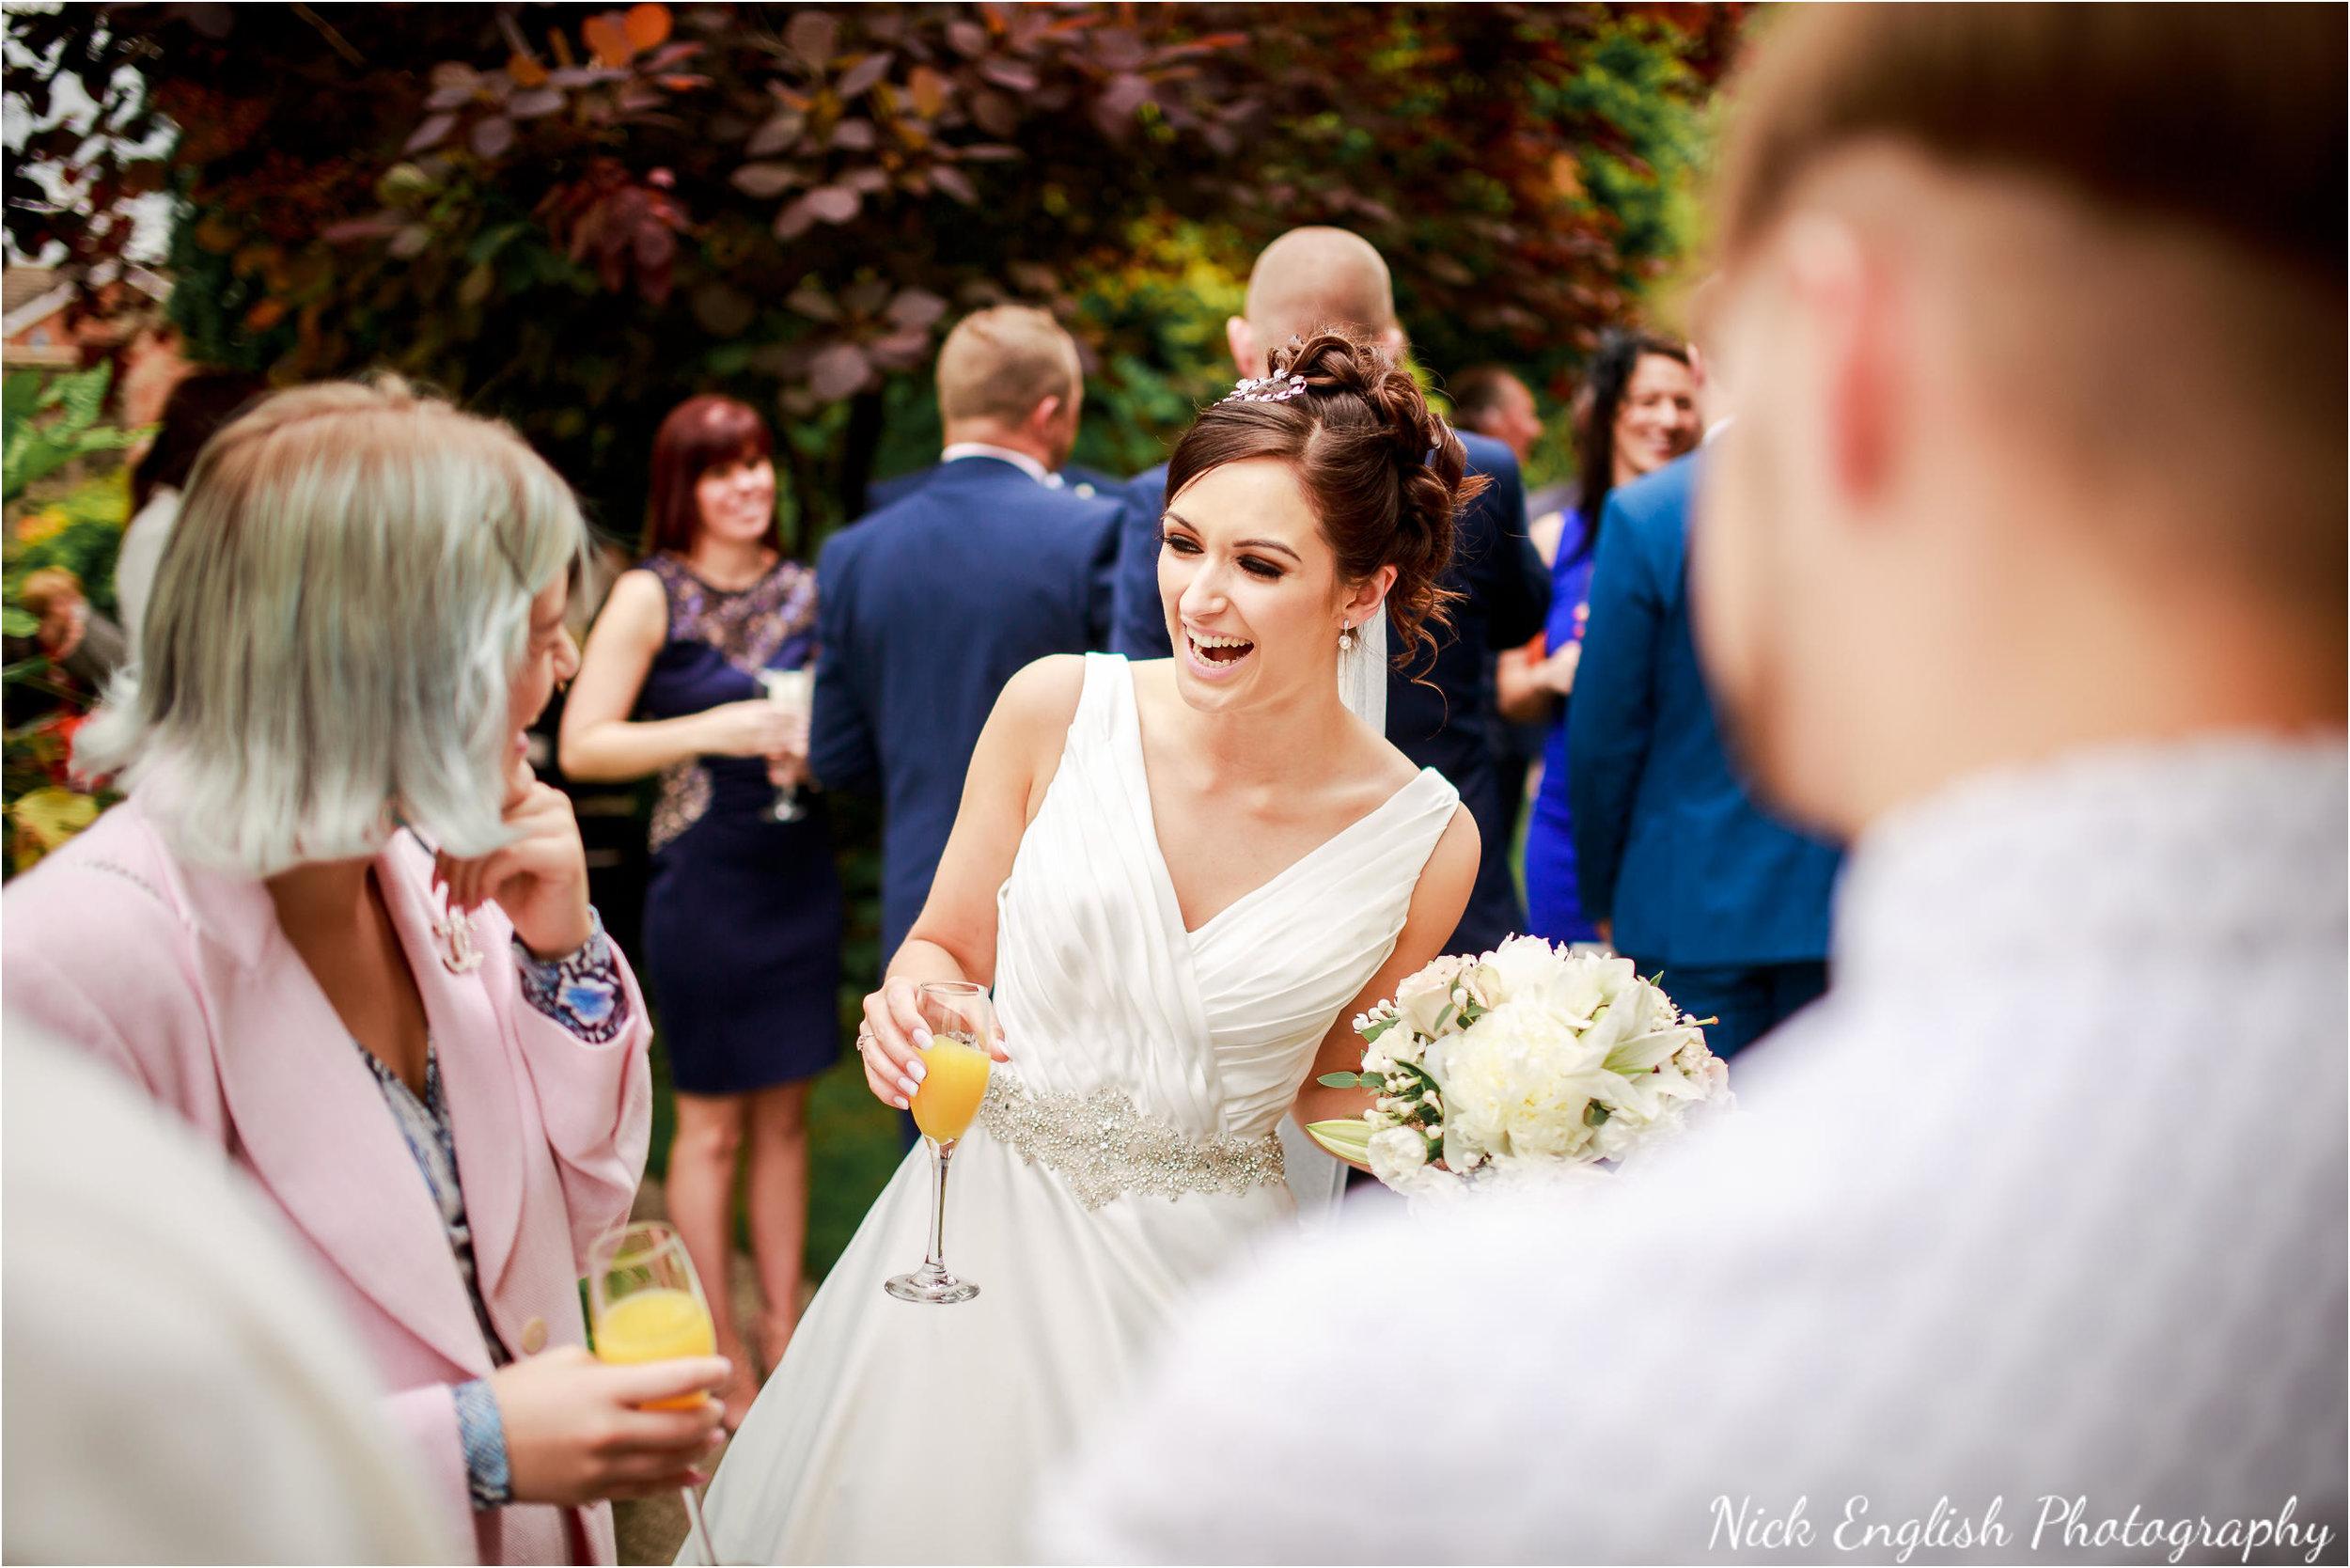 Emily David Wedding Photographs at Barton Grange Preston by Nick English Photography 115jpg.jpeg